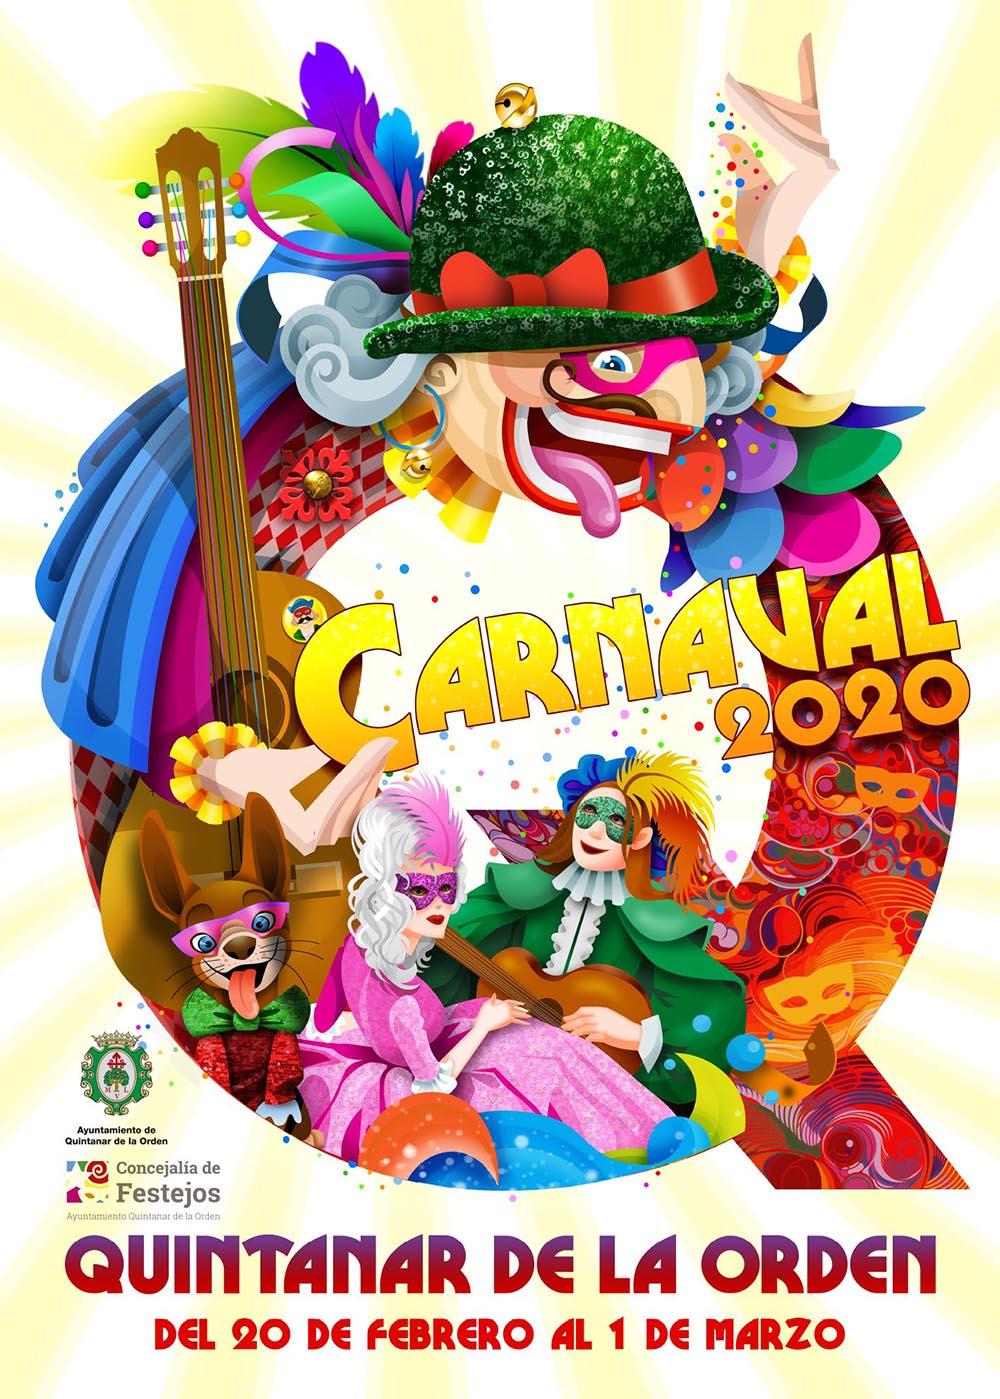 Quintanar Carnaval Carteles 2020_50x70_3mm